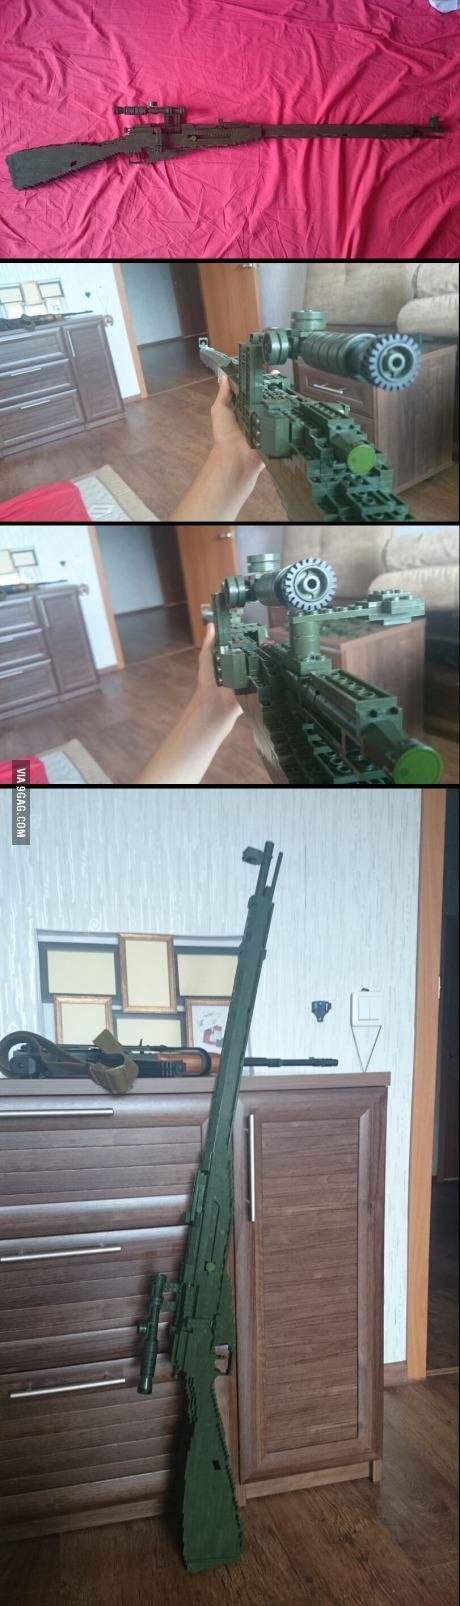 Lego M18/36 Moisin-Nagant Sniper-Rifle!